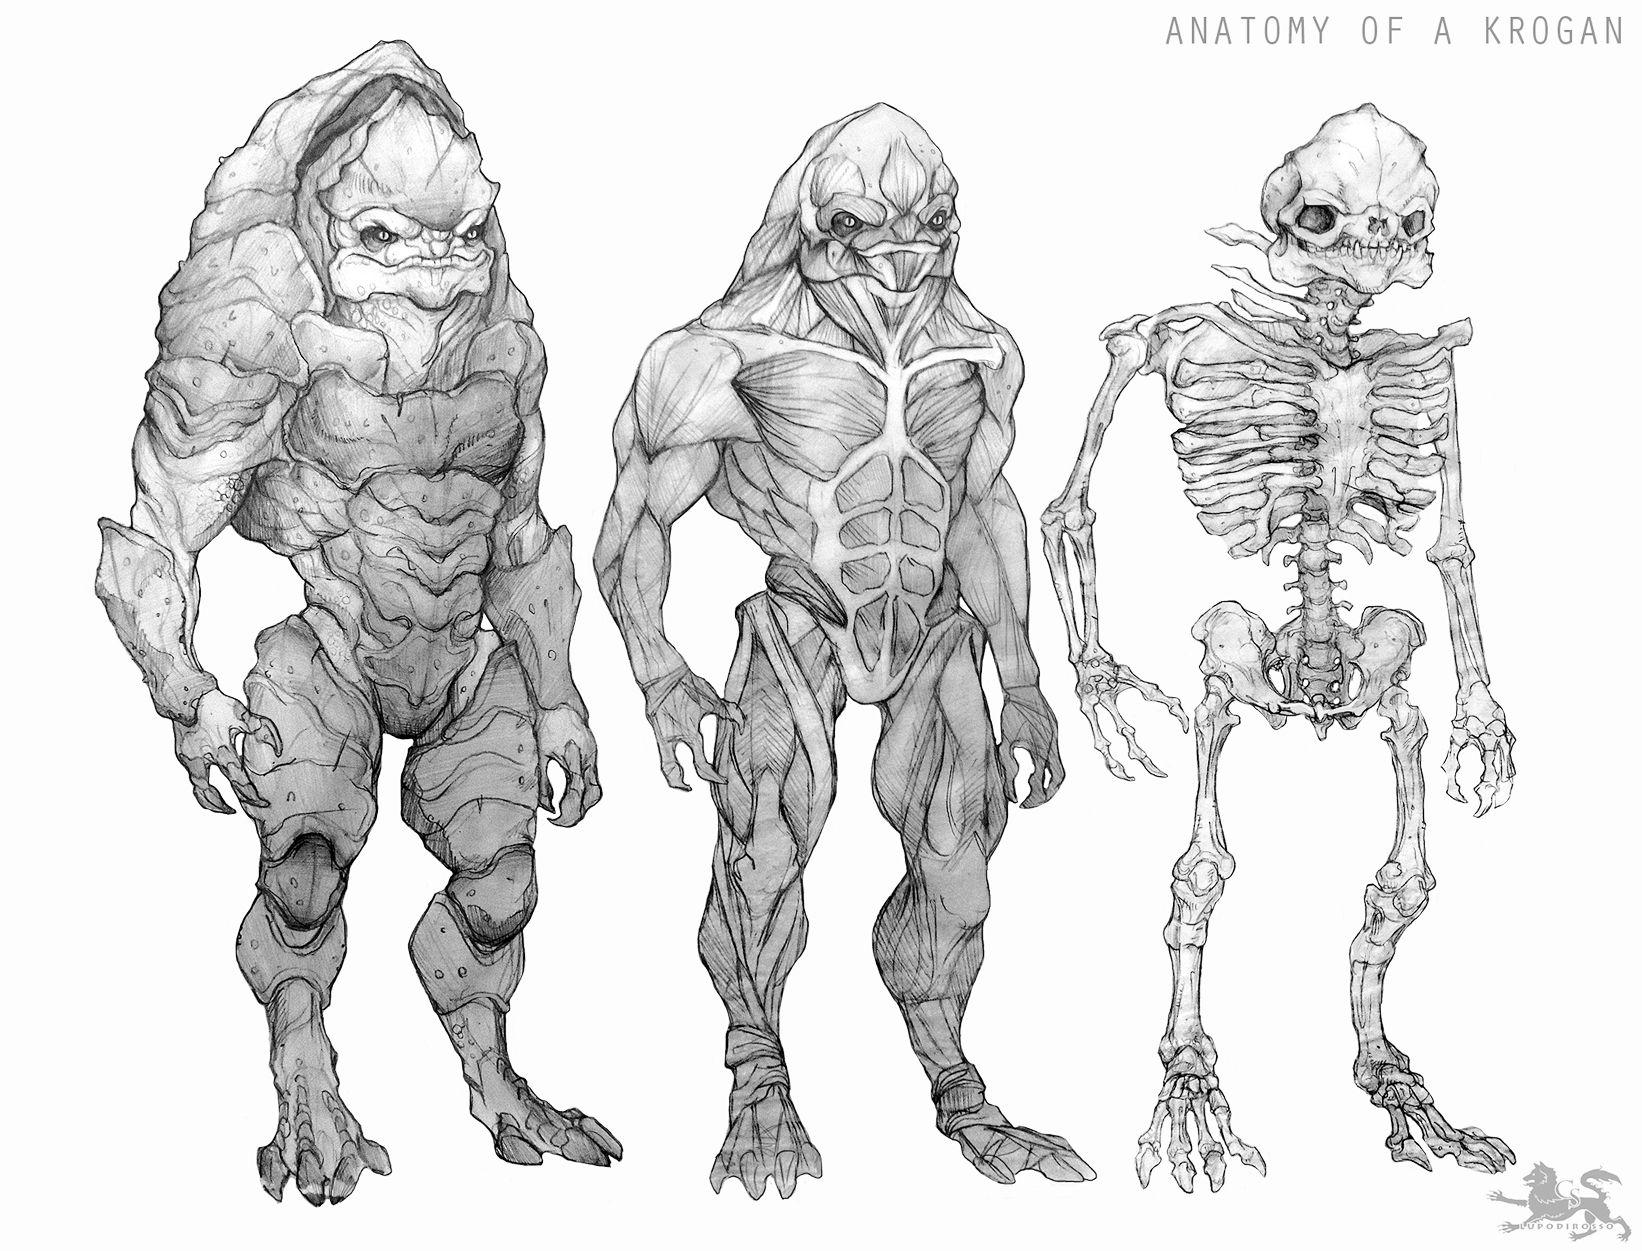 Anatomy Of A Krogan Clean Version By Lupodirosso On Deviantart